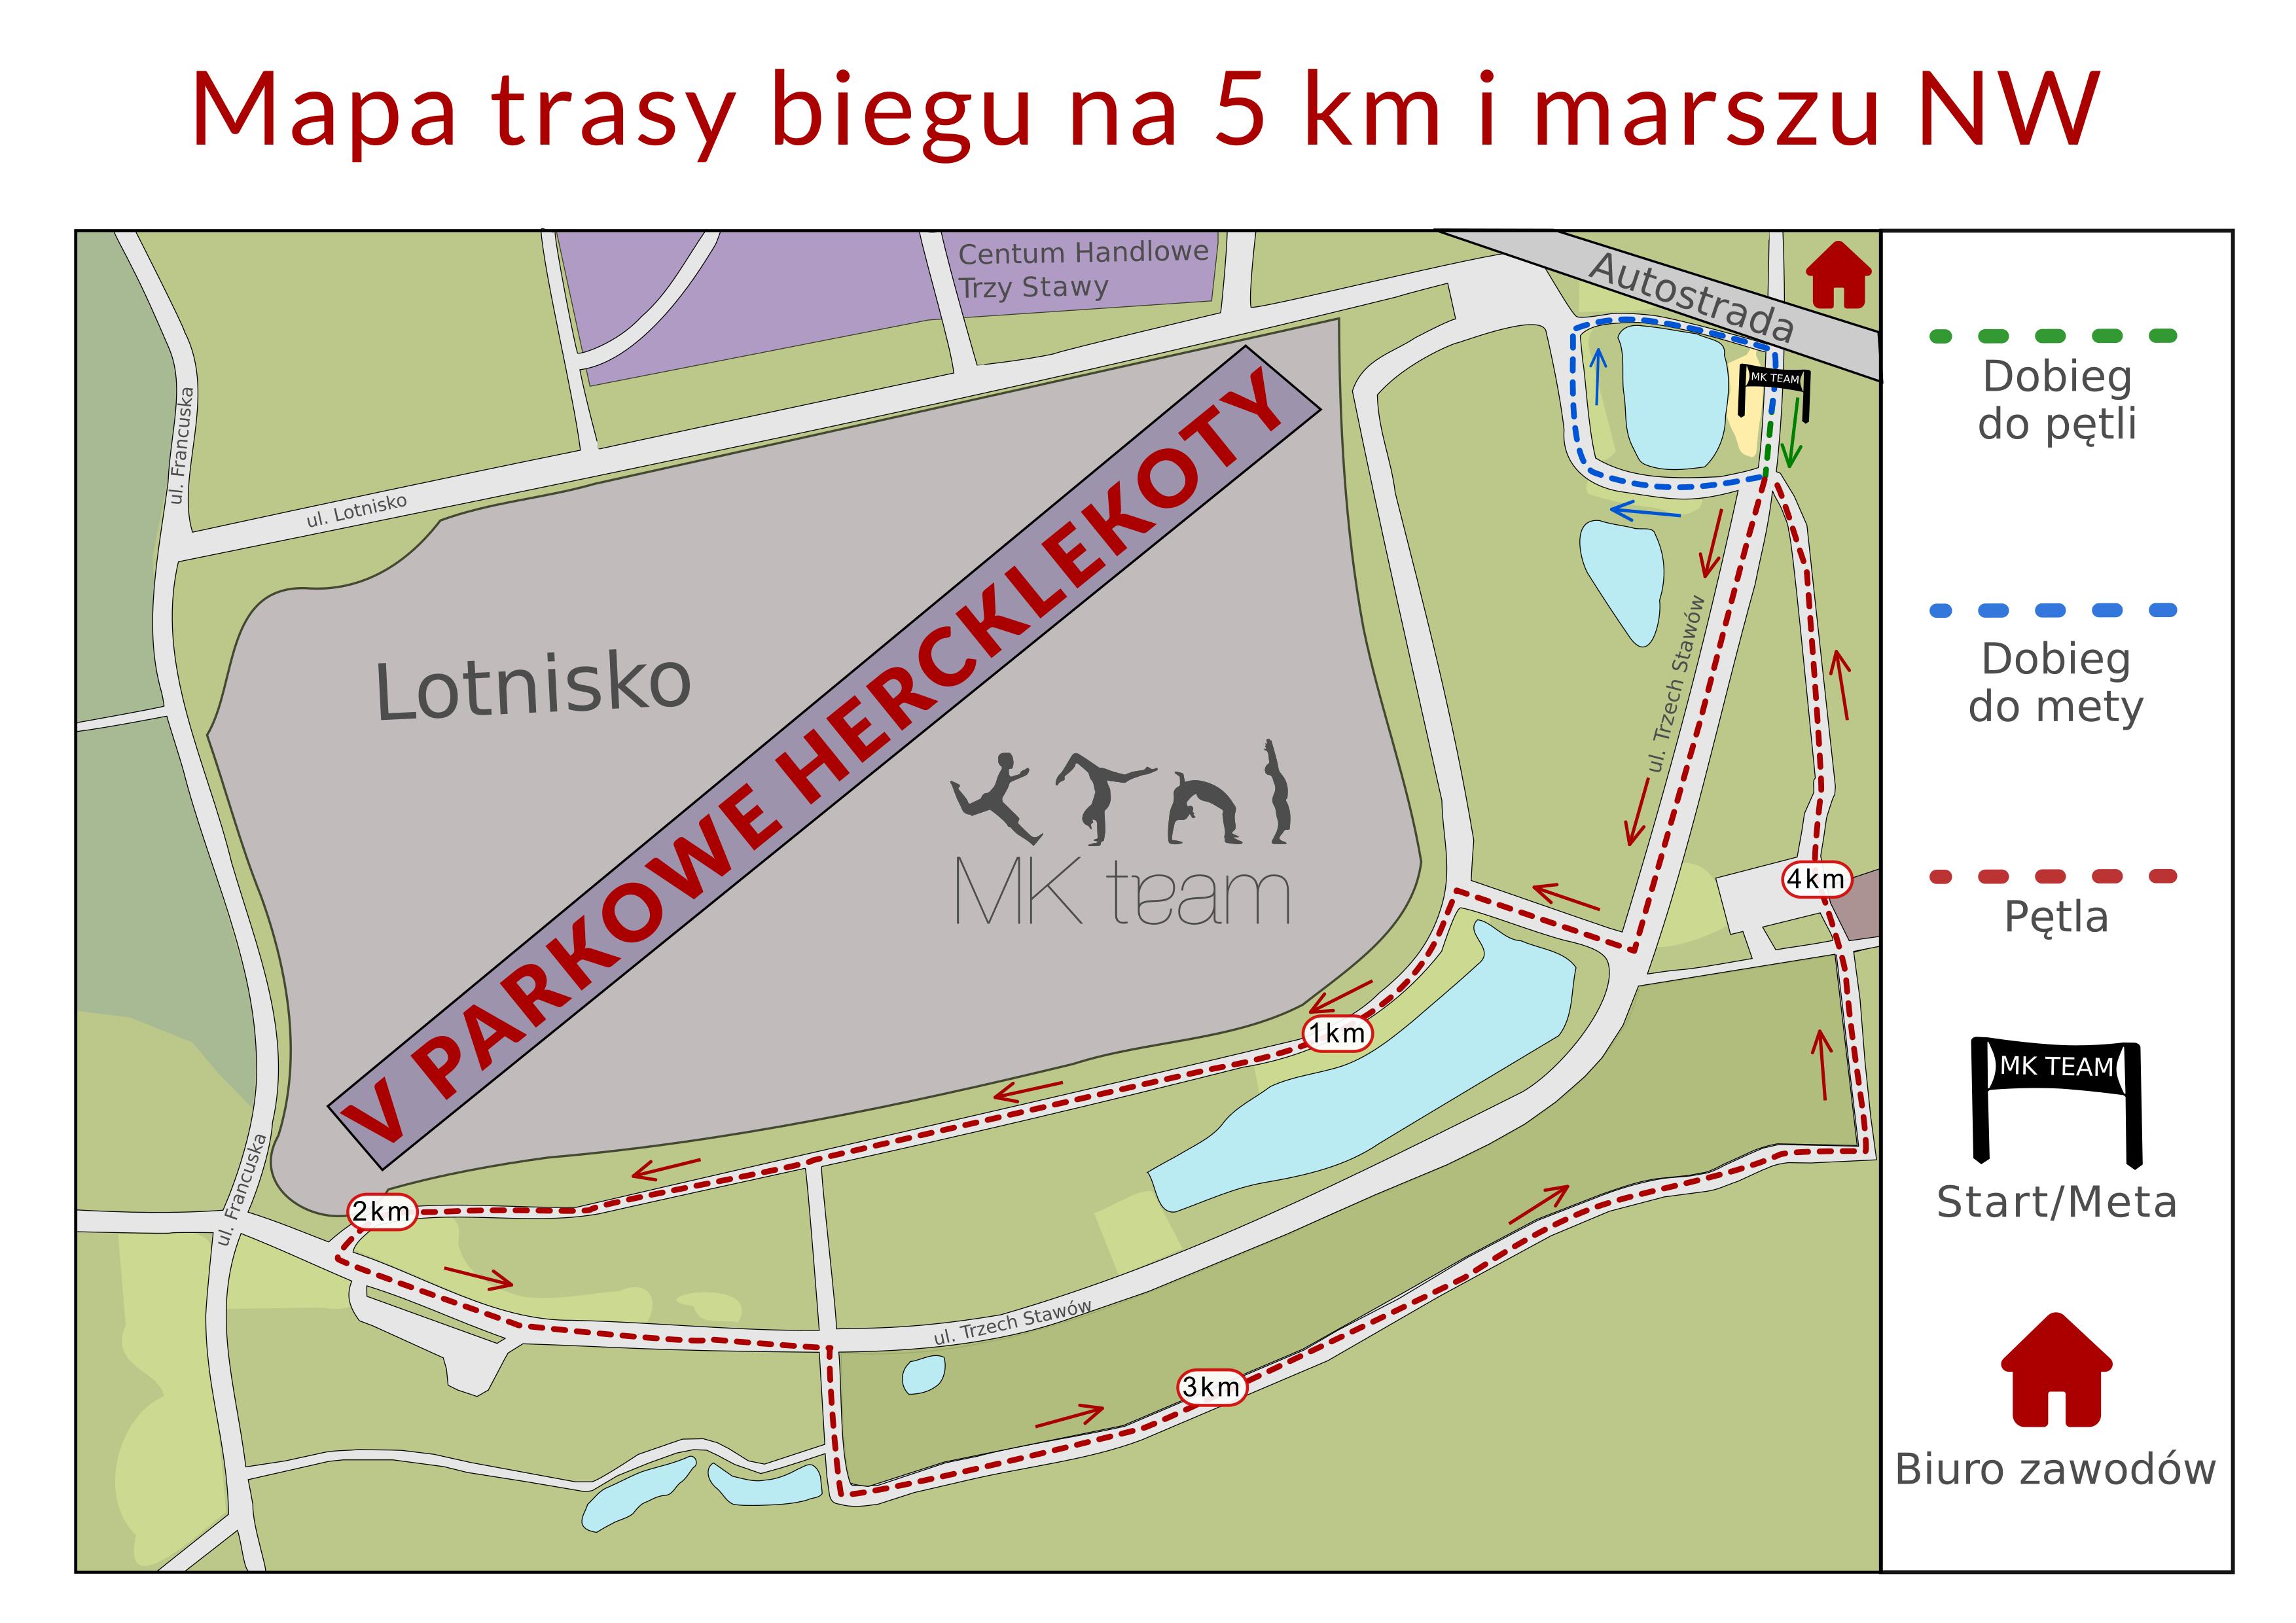 Mapa trasy 5 km